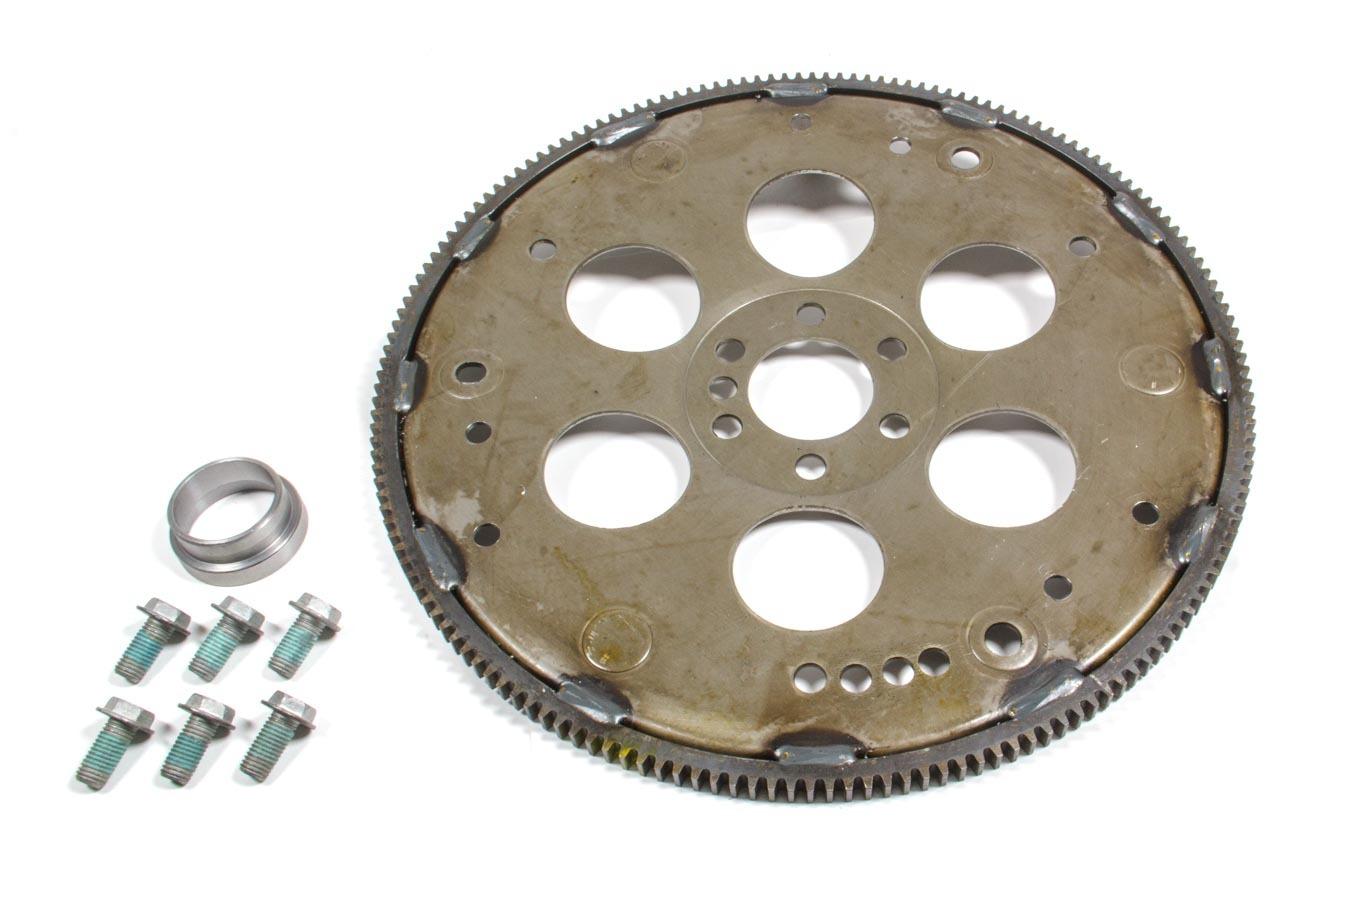 LS Engine to GM TH350/ 700R/200R4 Trans Kit